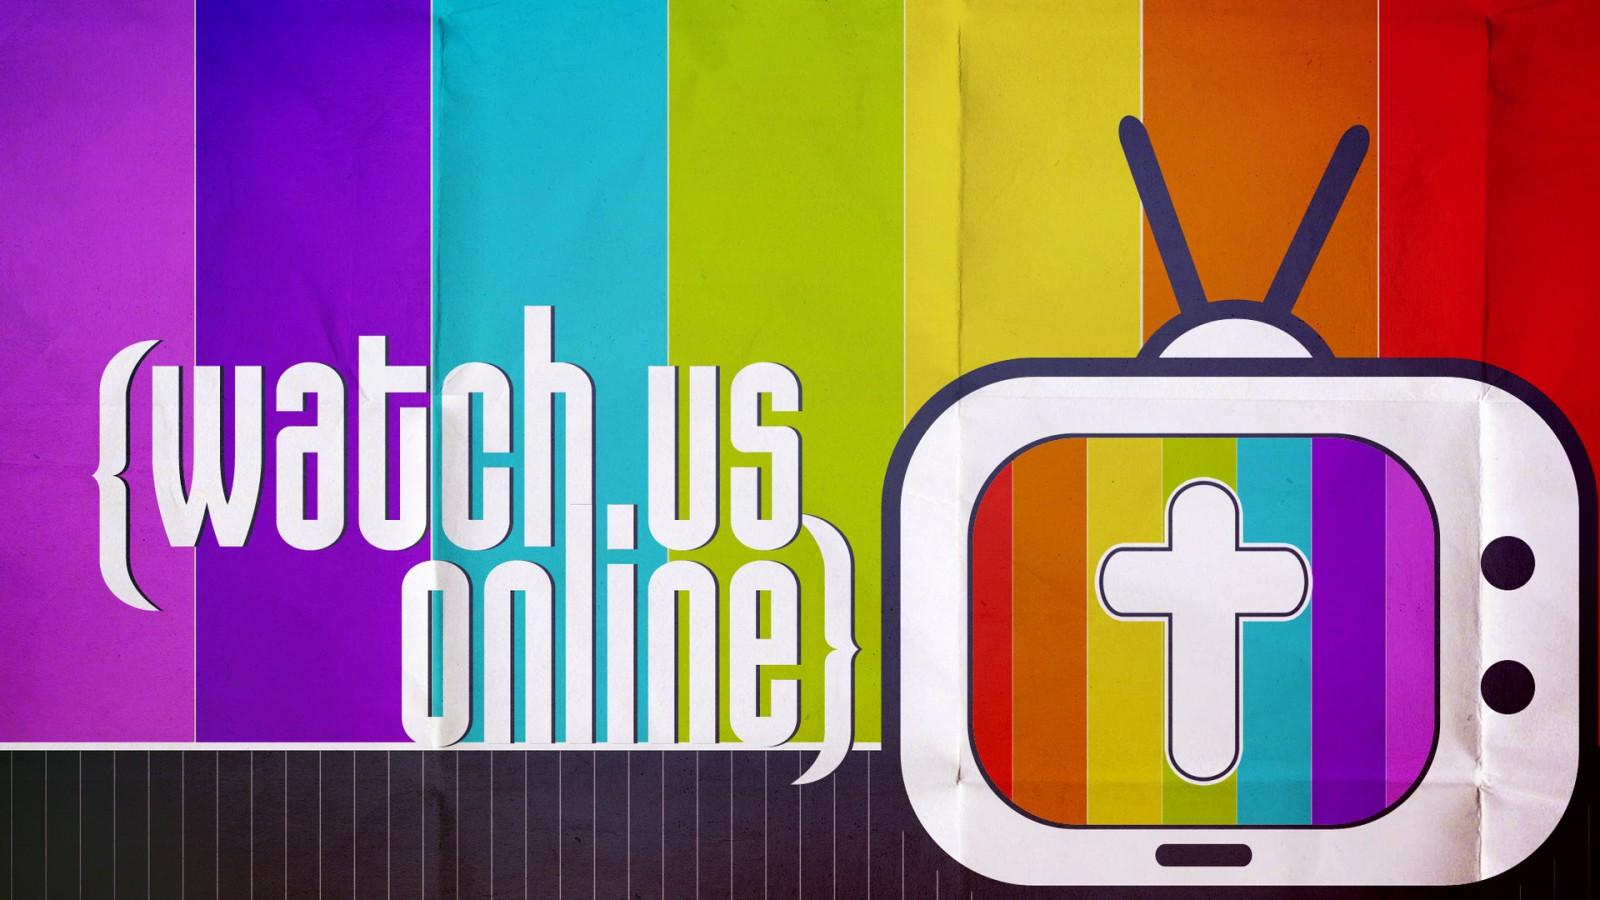 watch_us_online-title-2-Wide 16x9